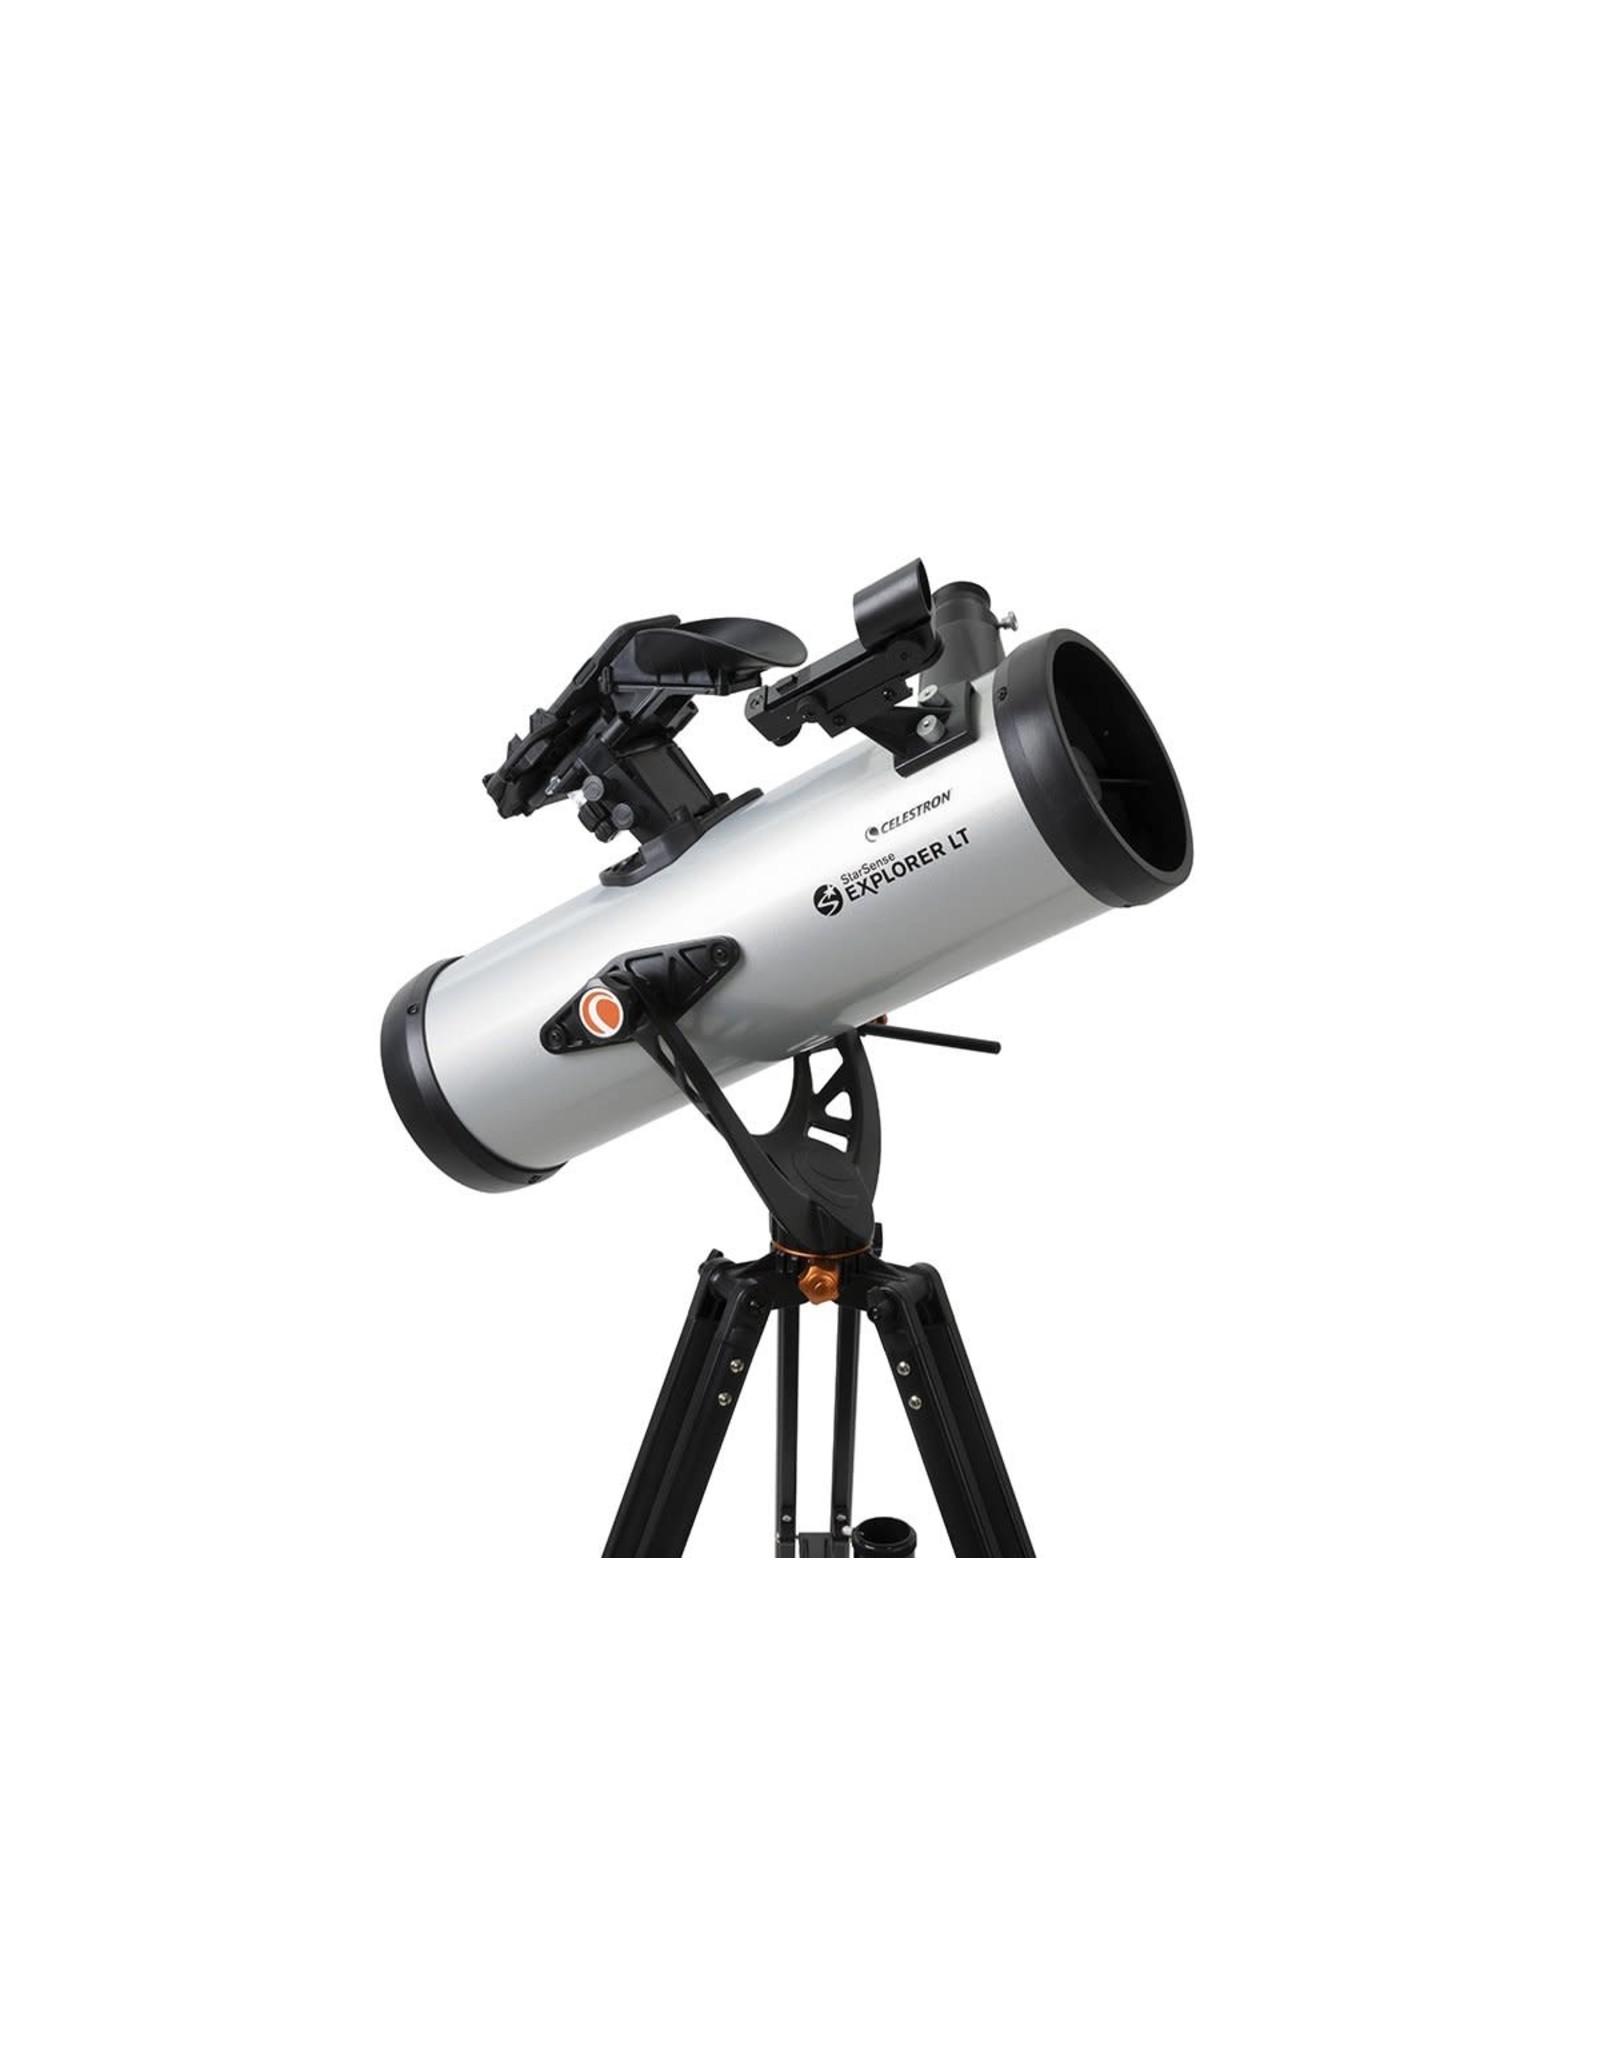 Celestron StarSense Explorer™ LT 114 Smartphone App-Enabled Newtonian Reflector Telescope